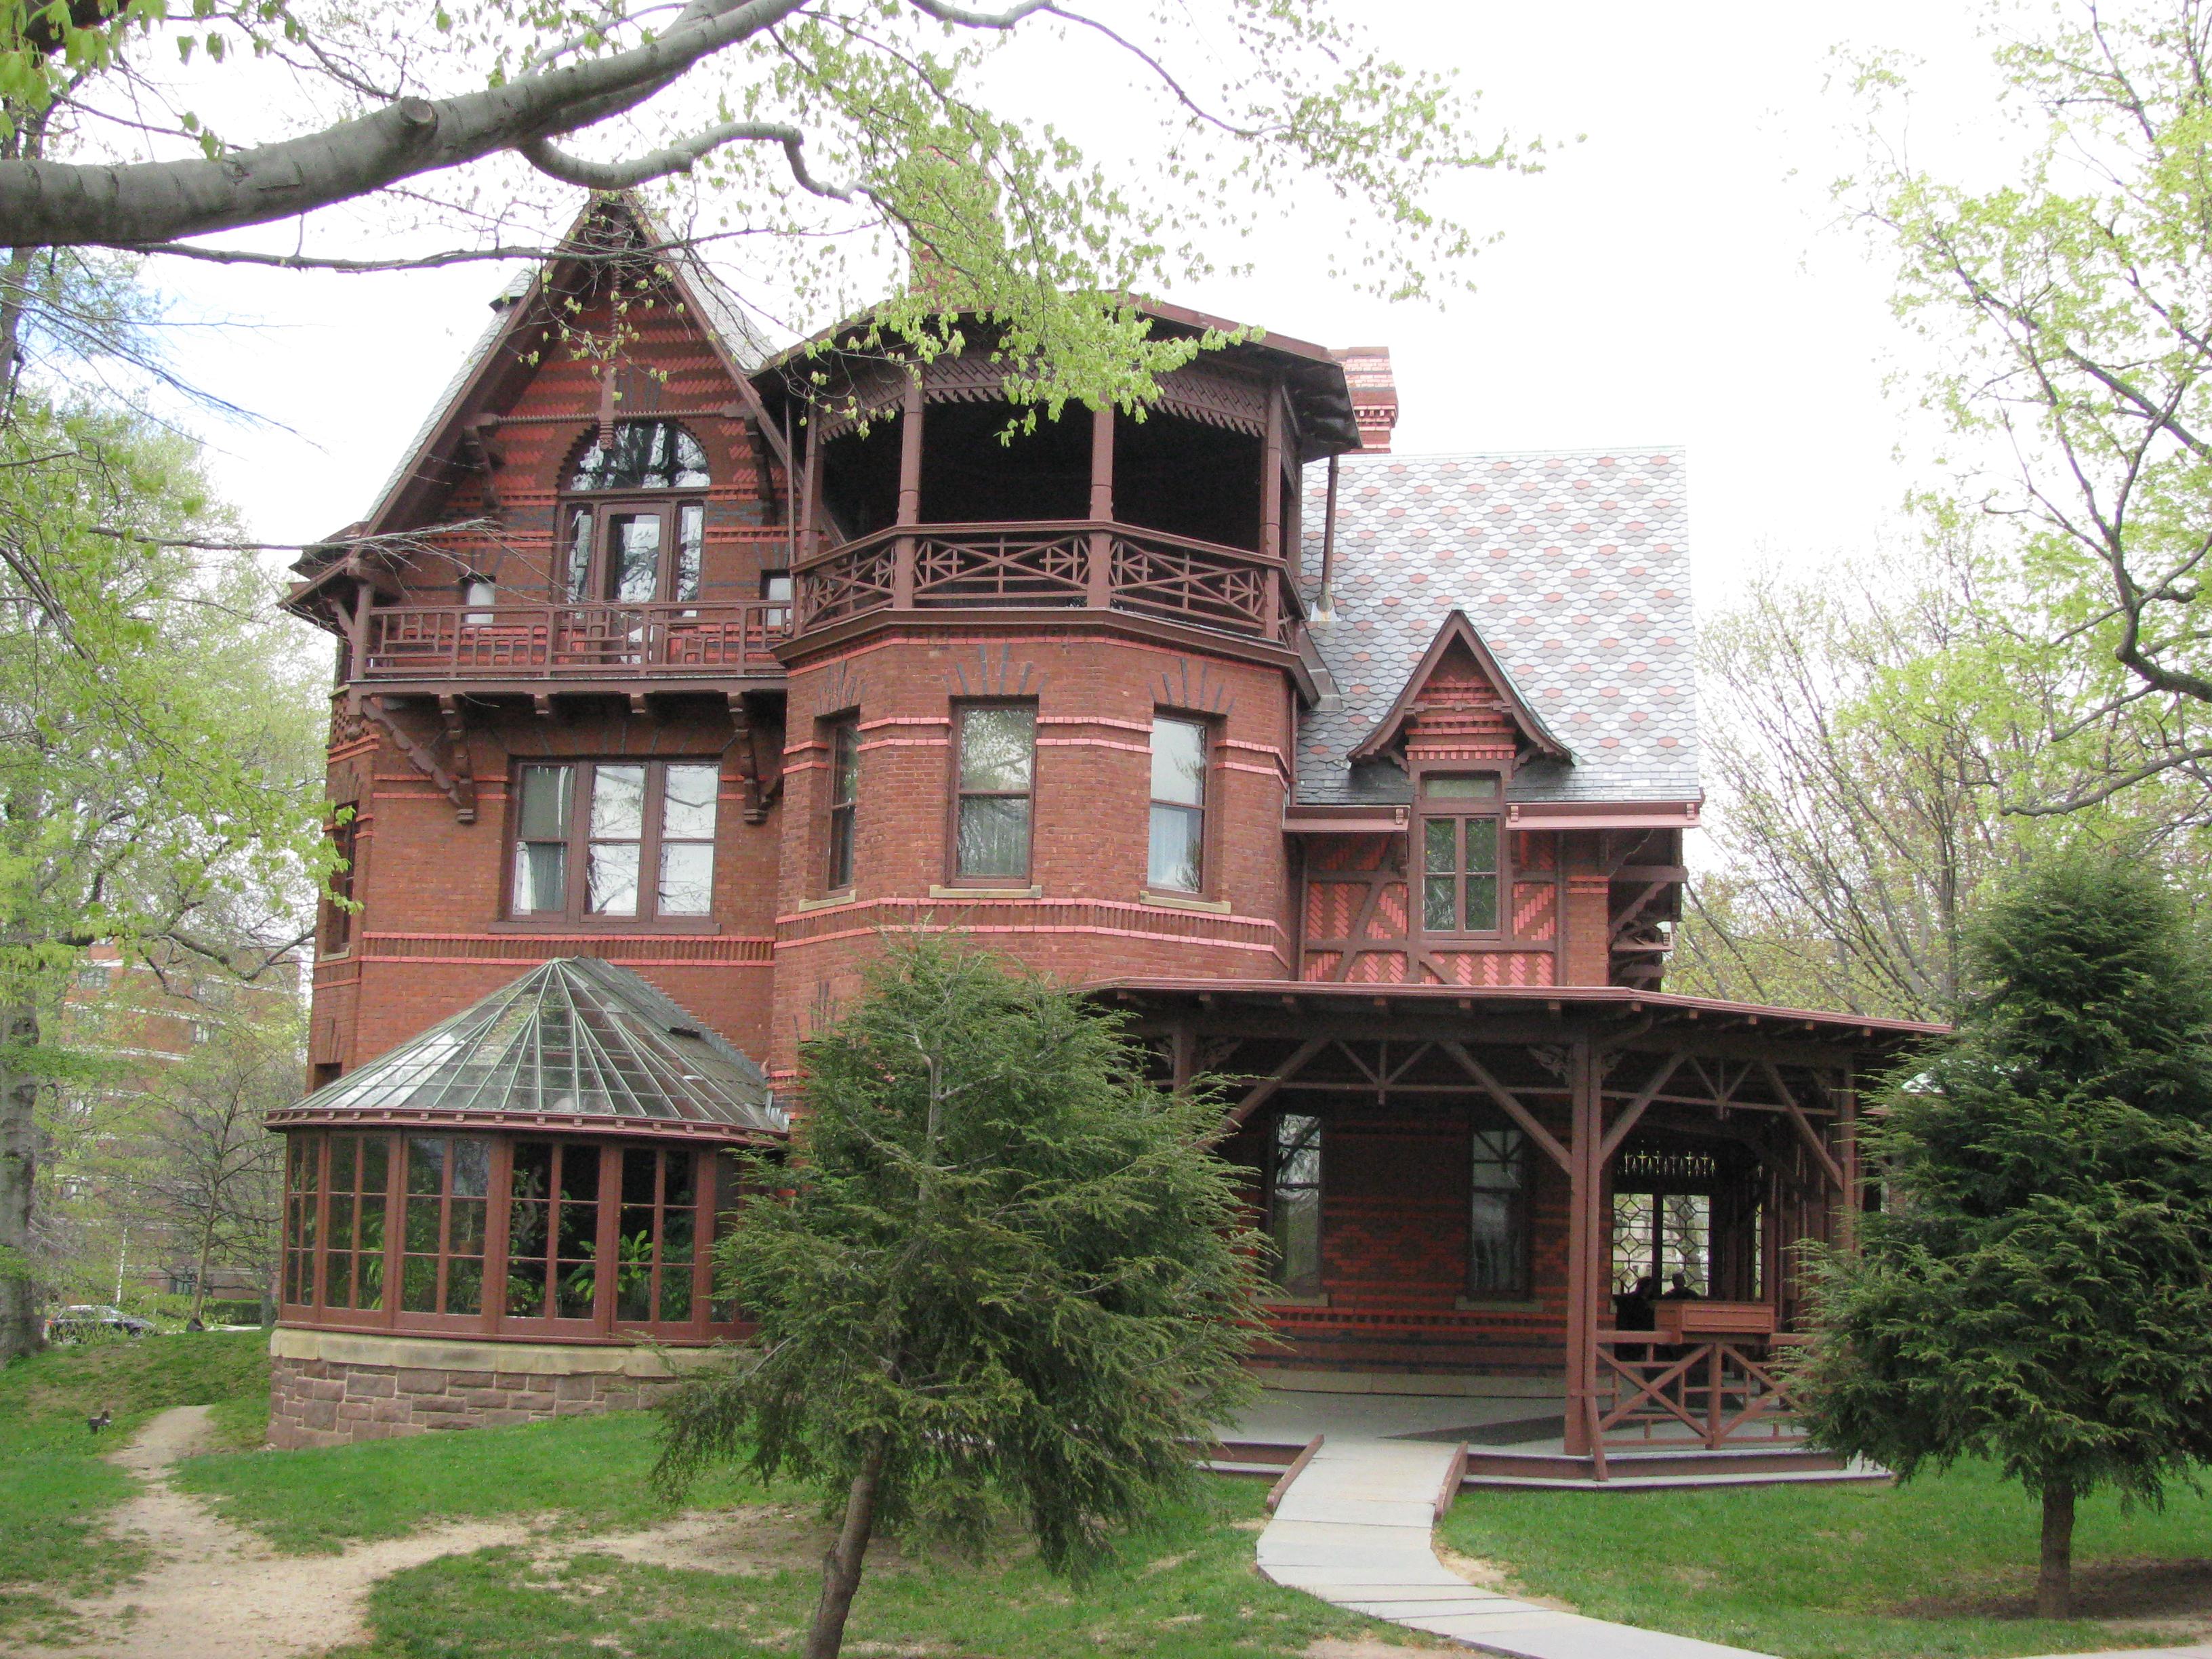 Mark Twain House 50 Year Project